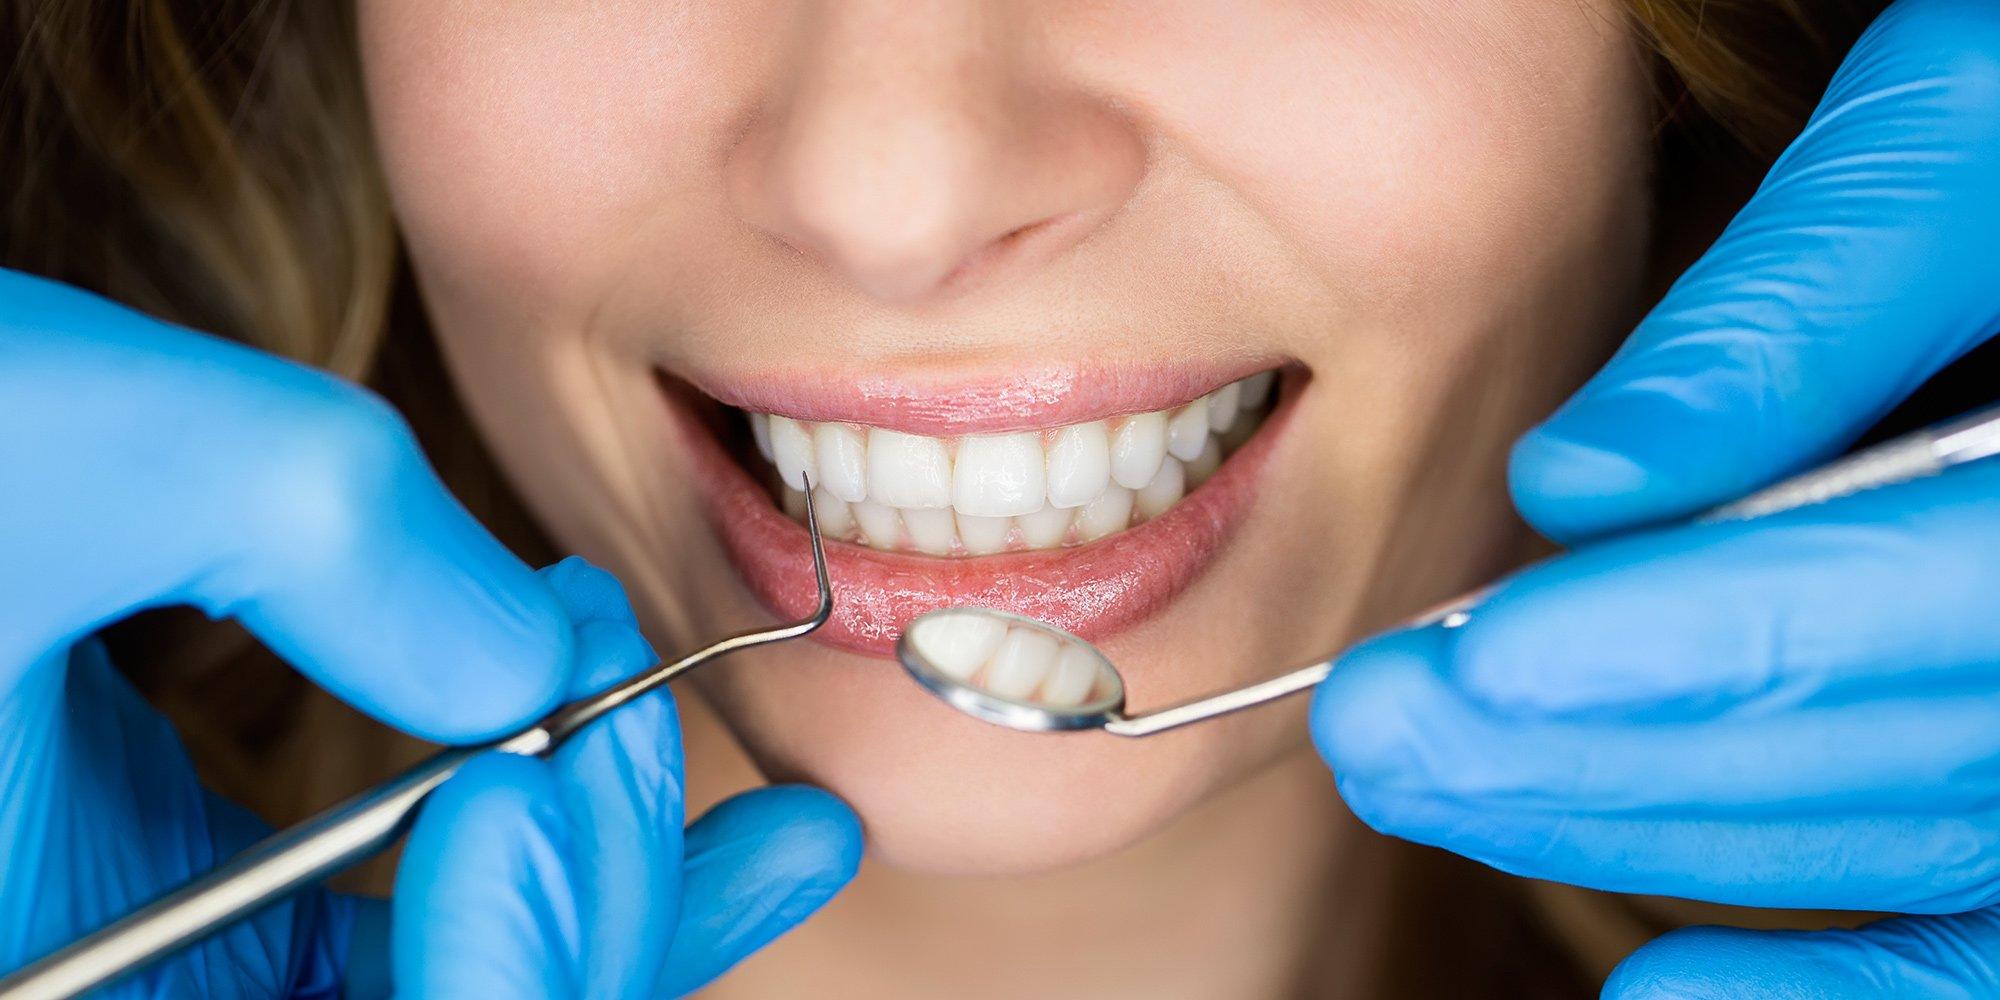 implantology experts